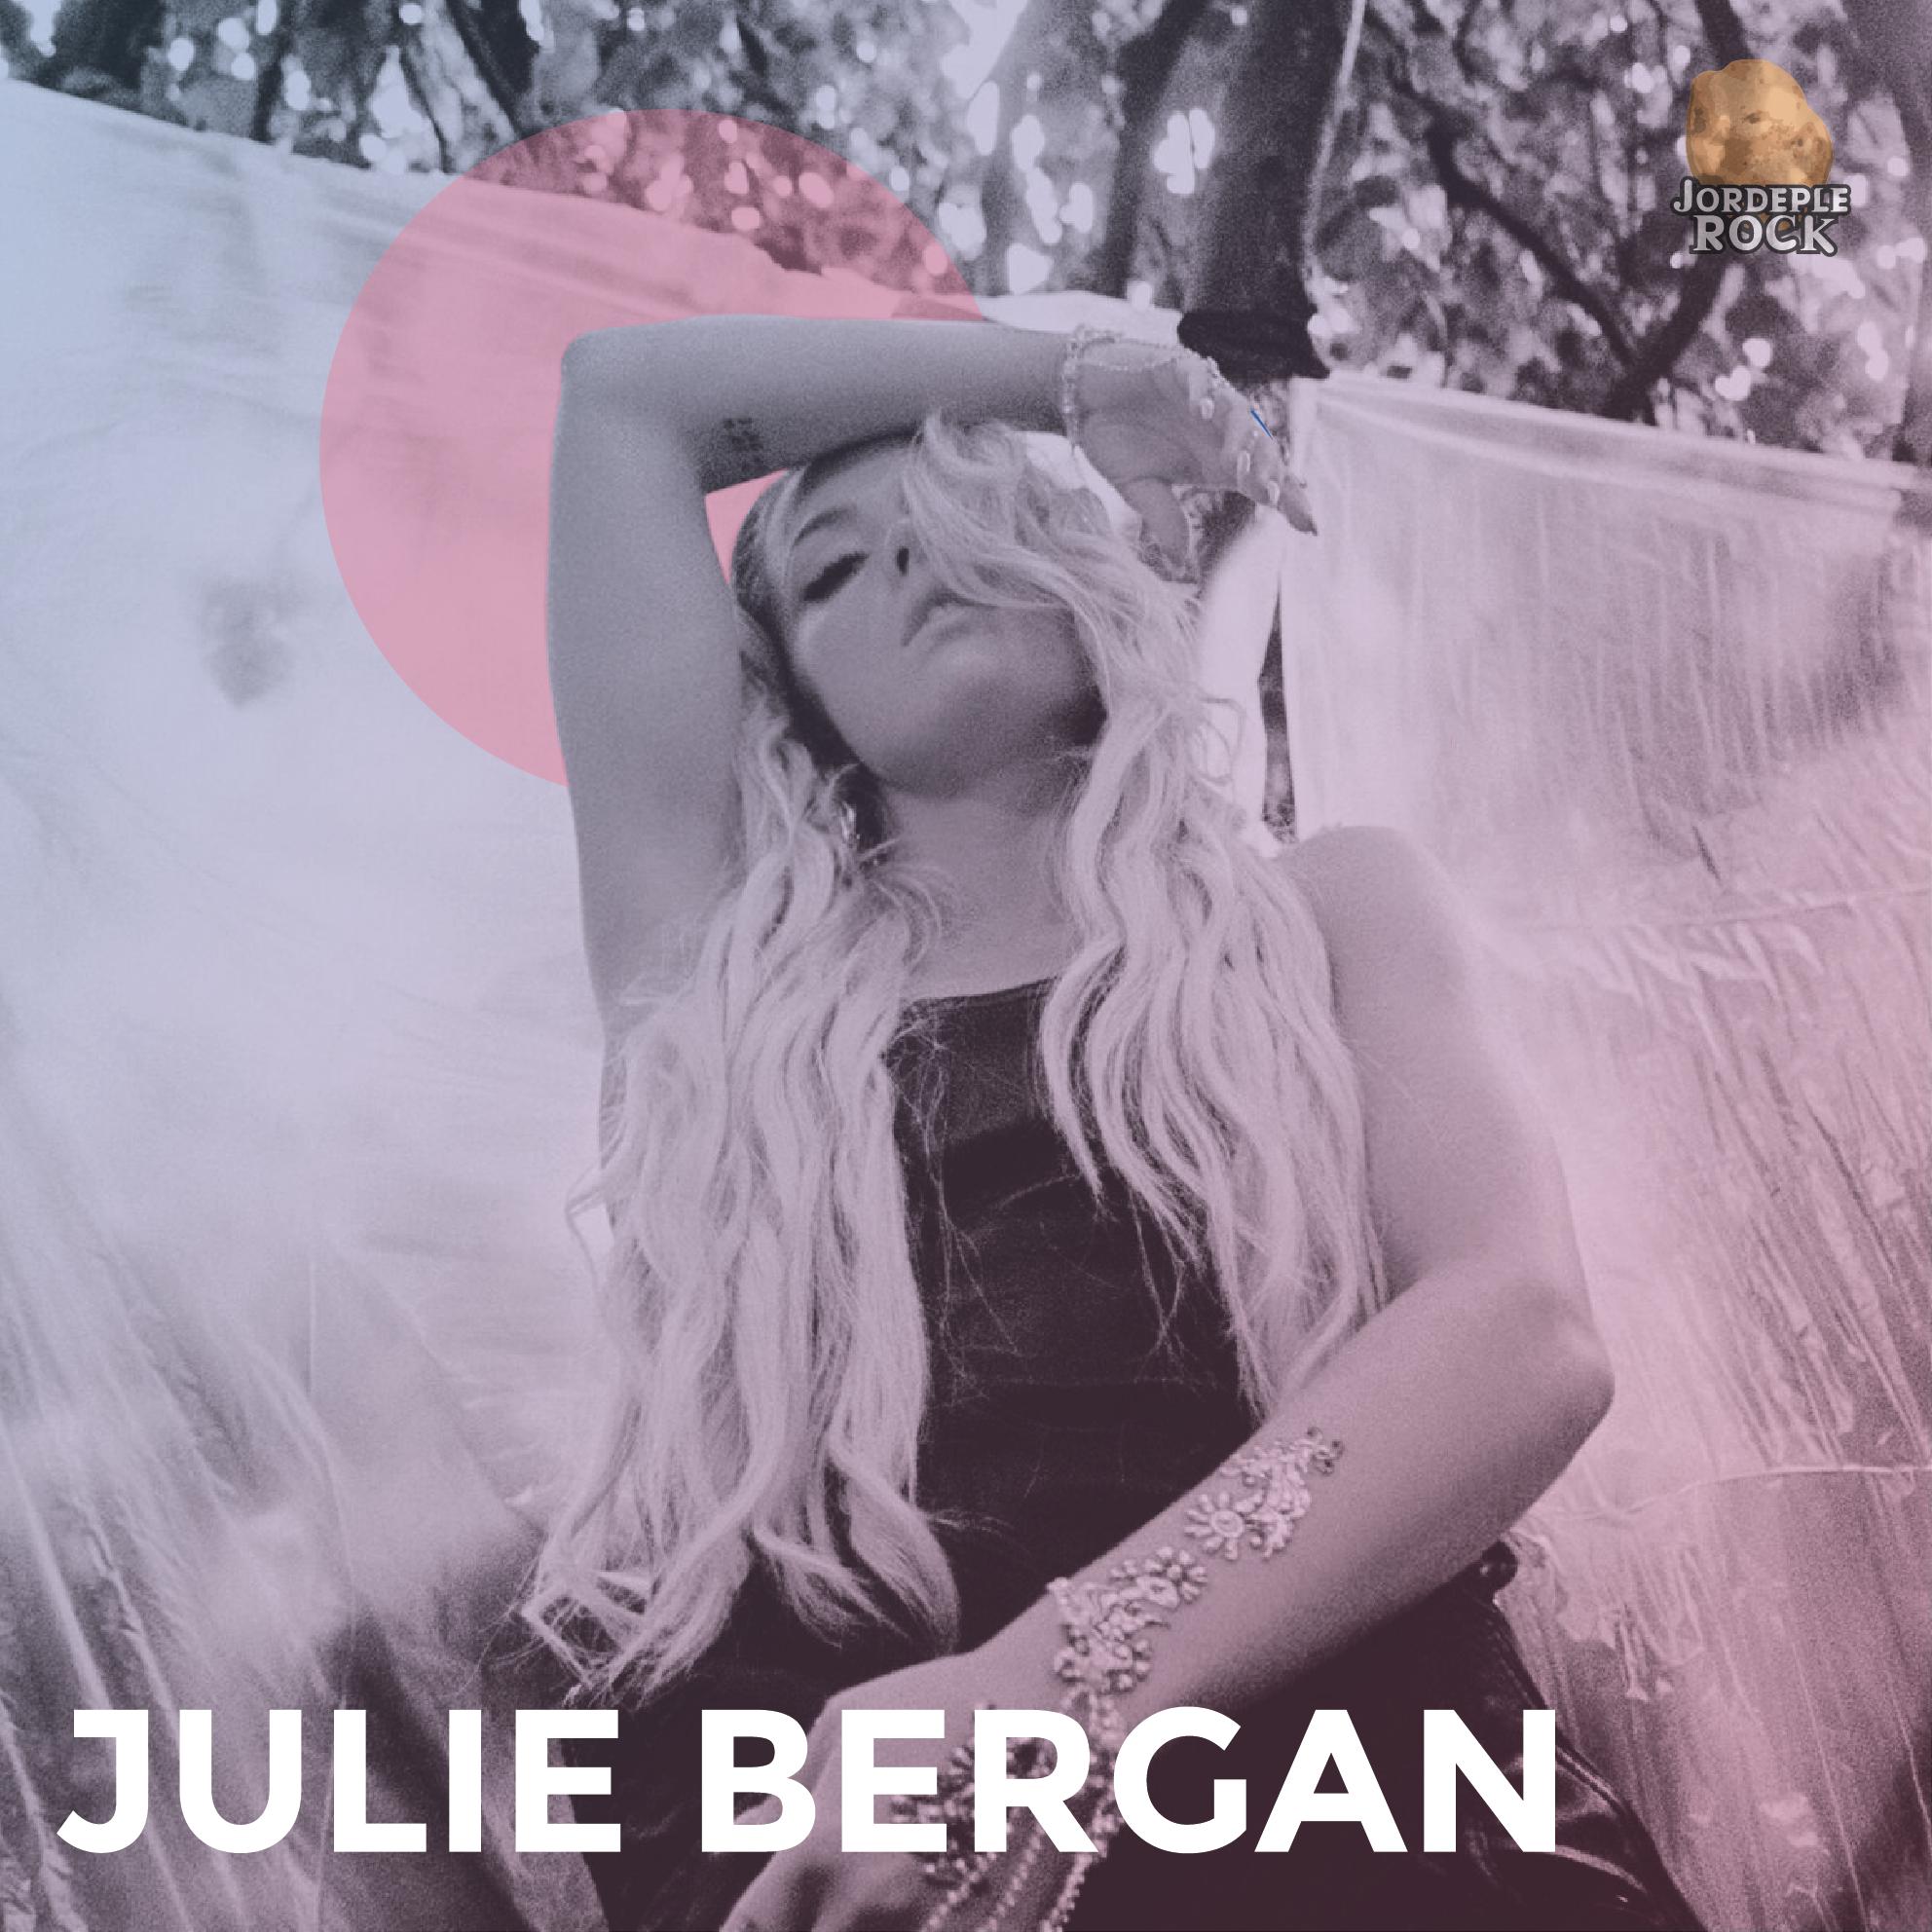 Julie Bergan - Wall_photo-01.png